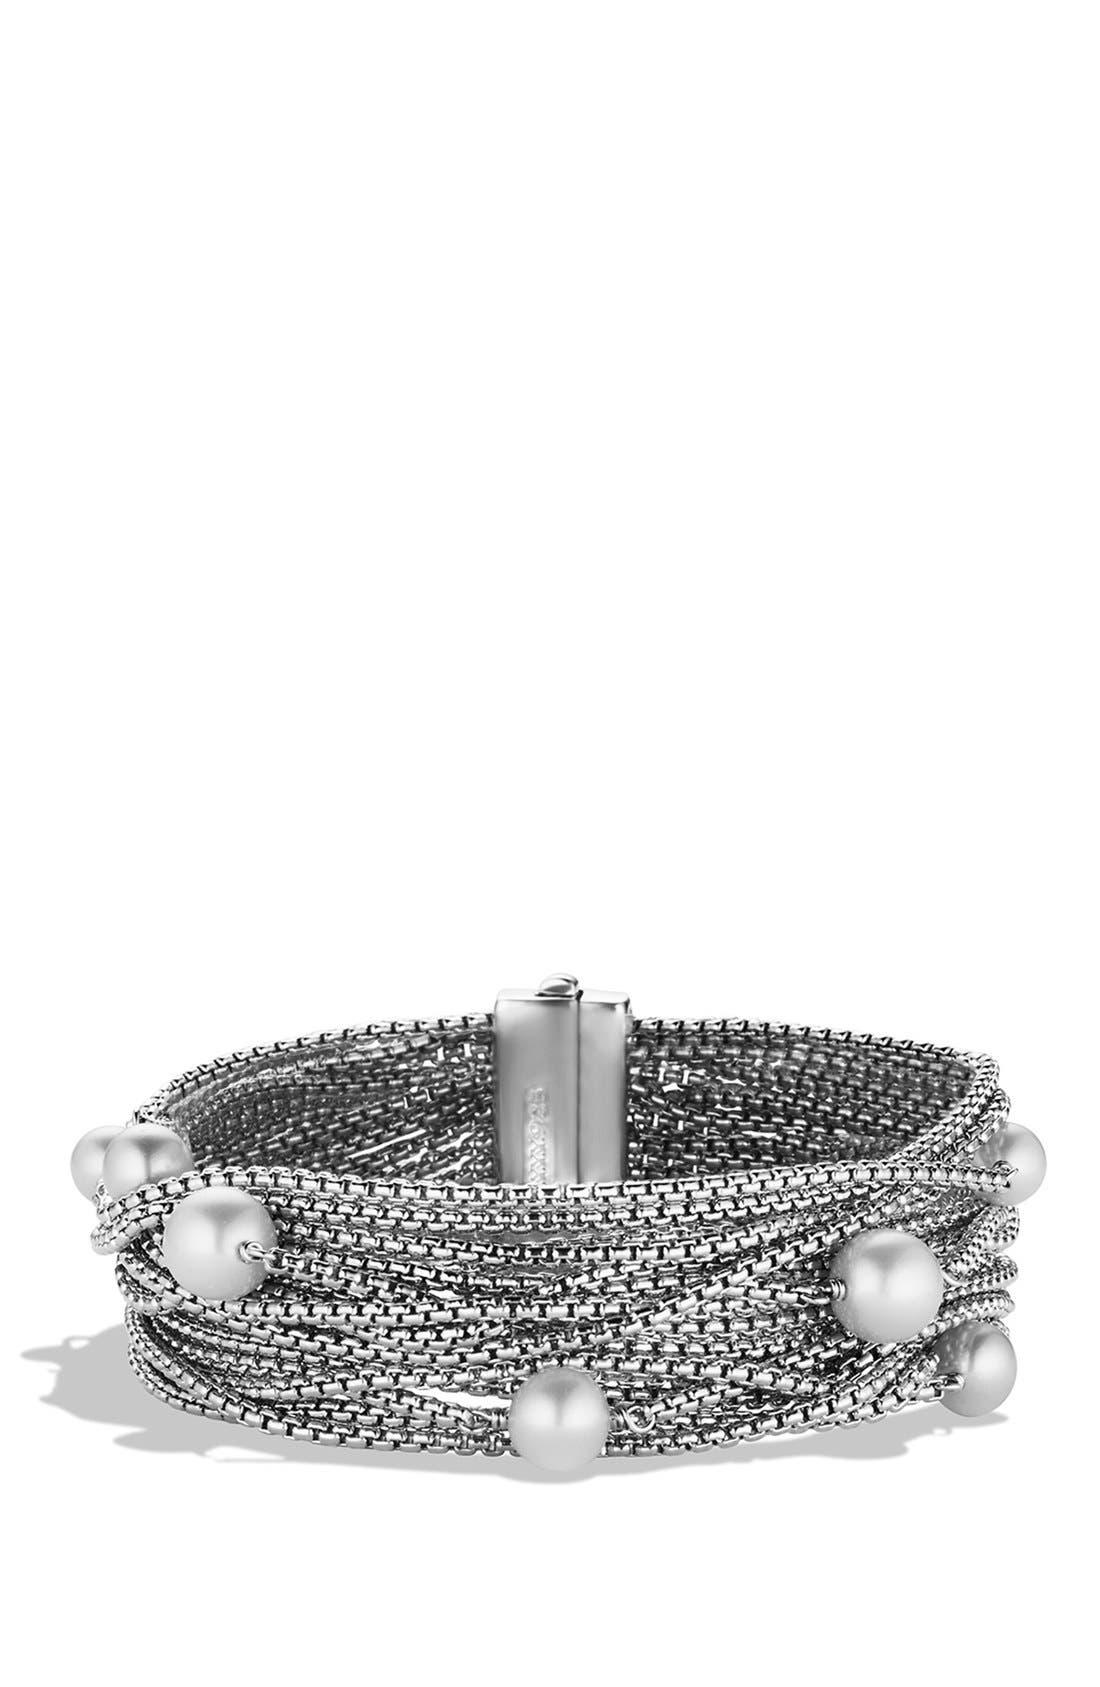 Main Image - David Yurman Sixteen-Row Chain Bracelet with Pearls